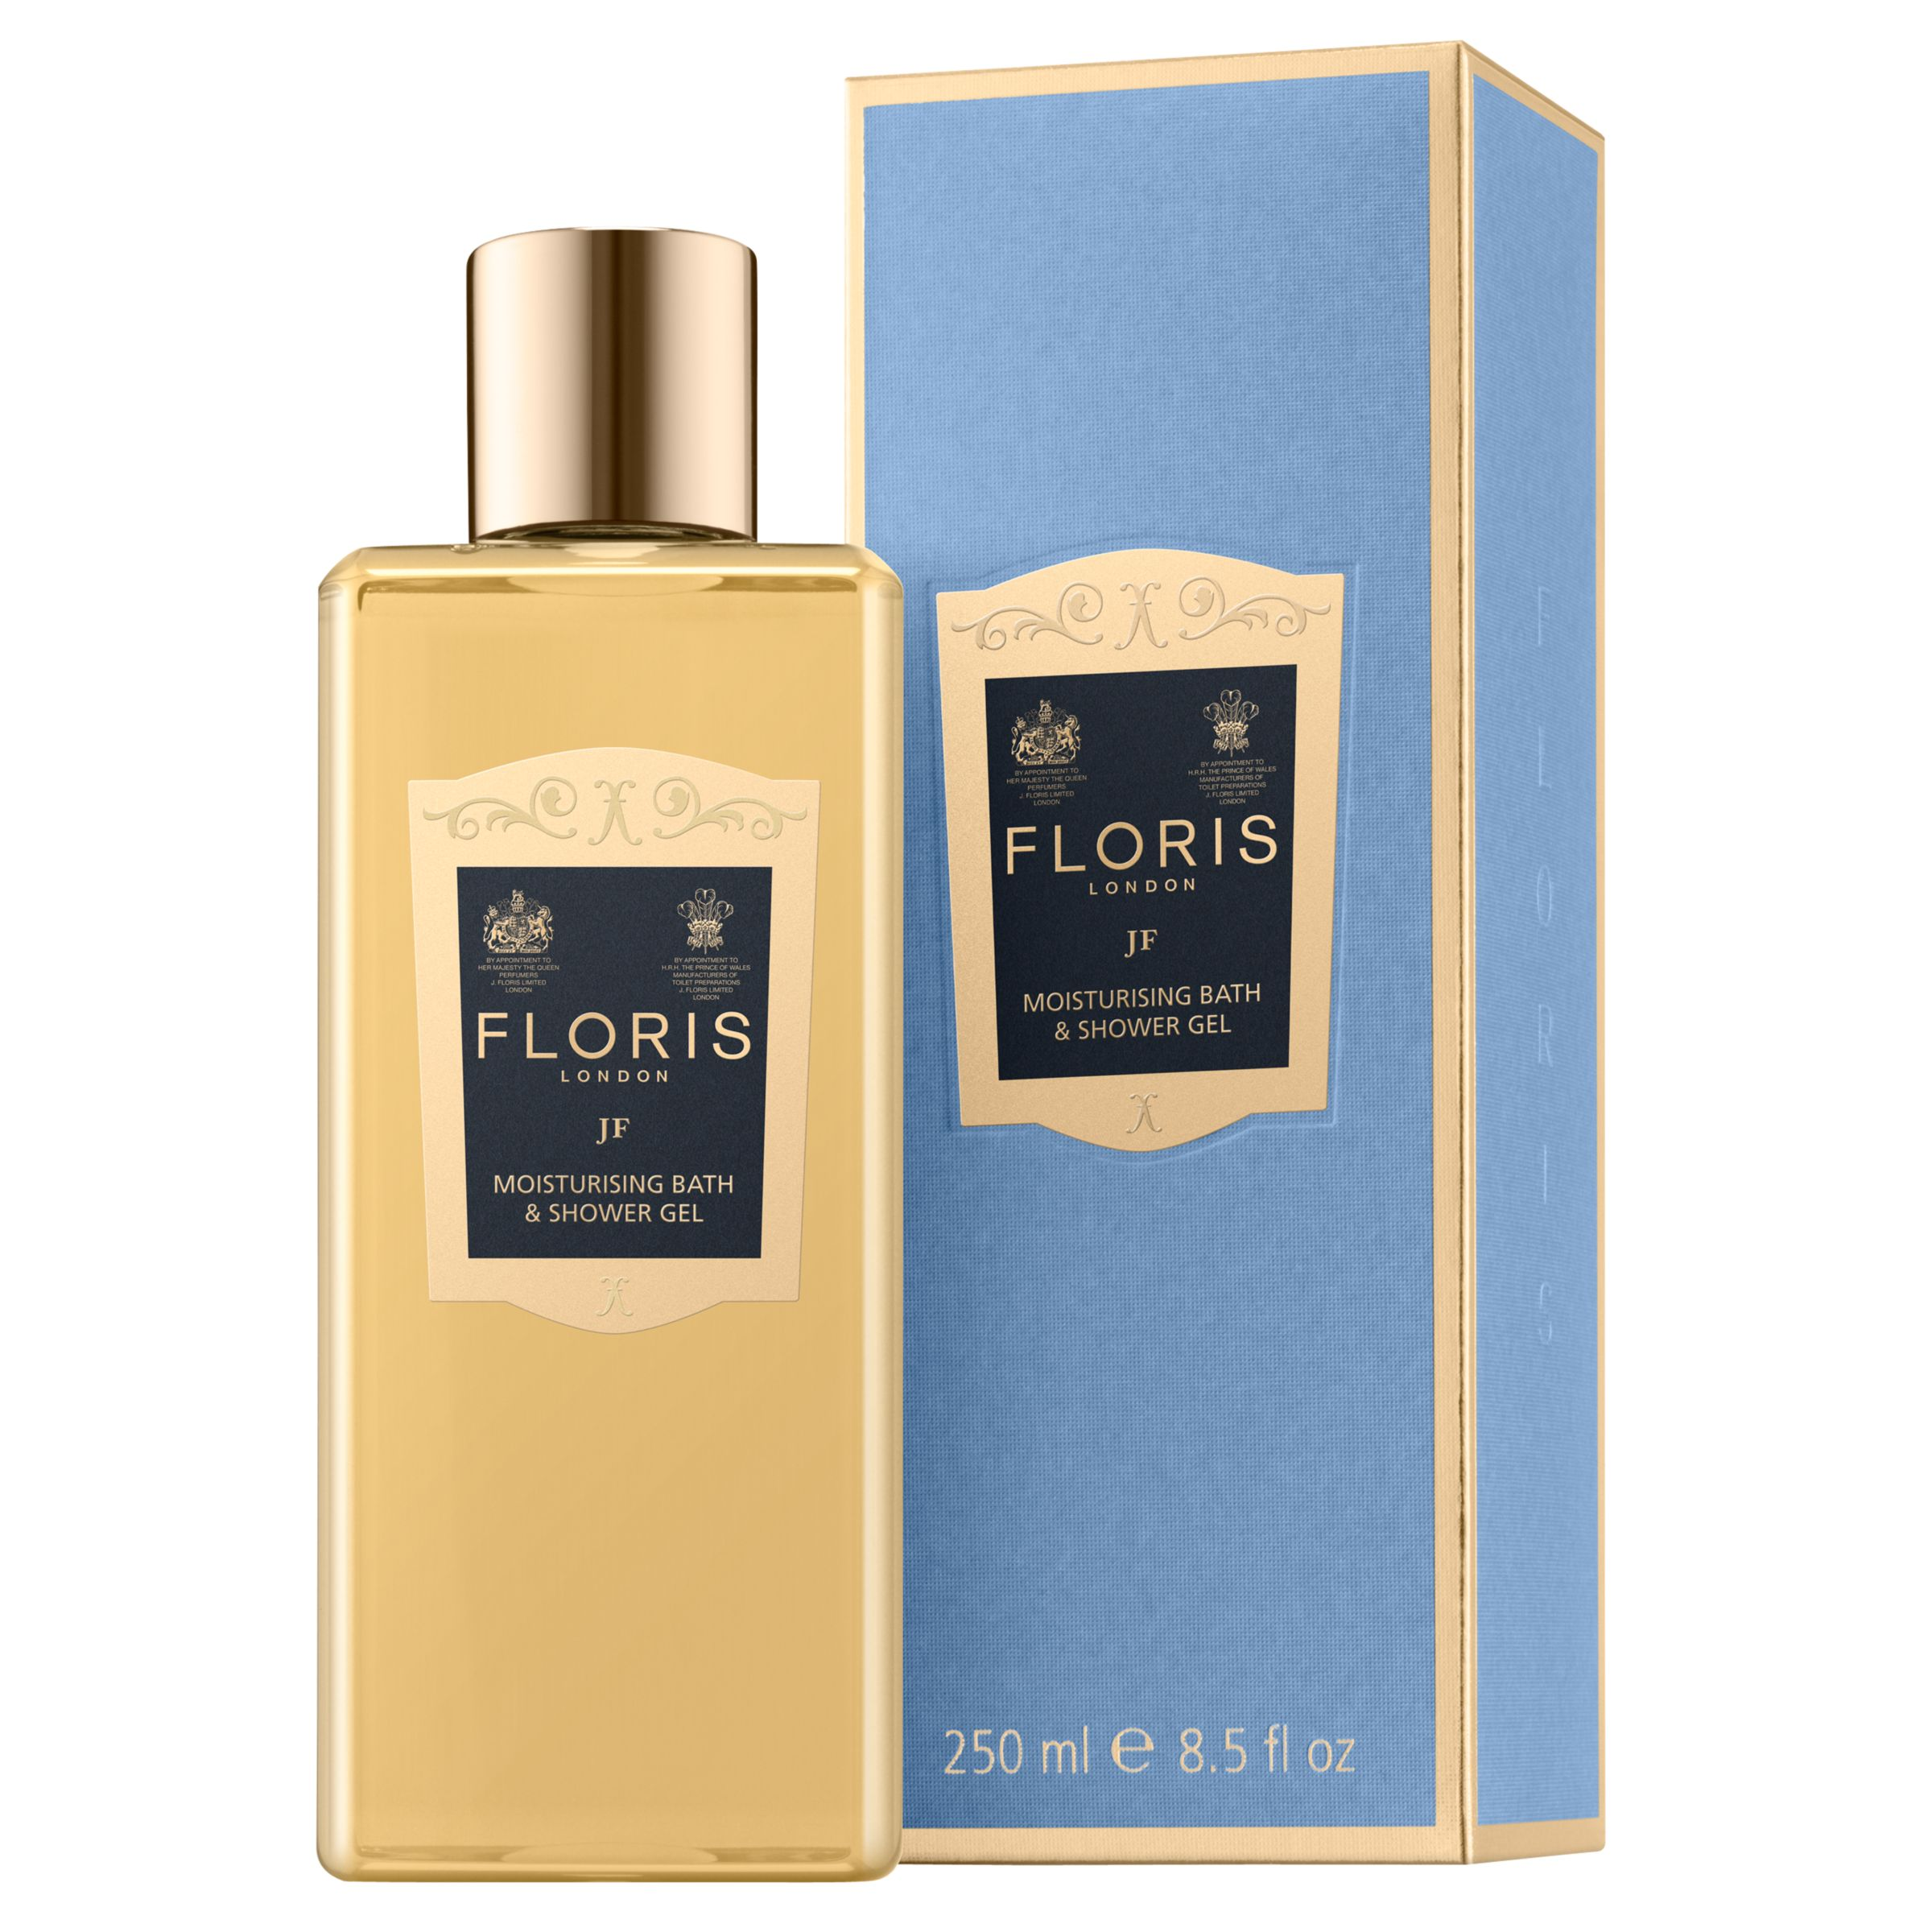 Floris Floris JF Bath and Shower Gel, 250ml